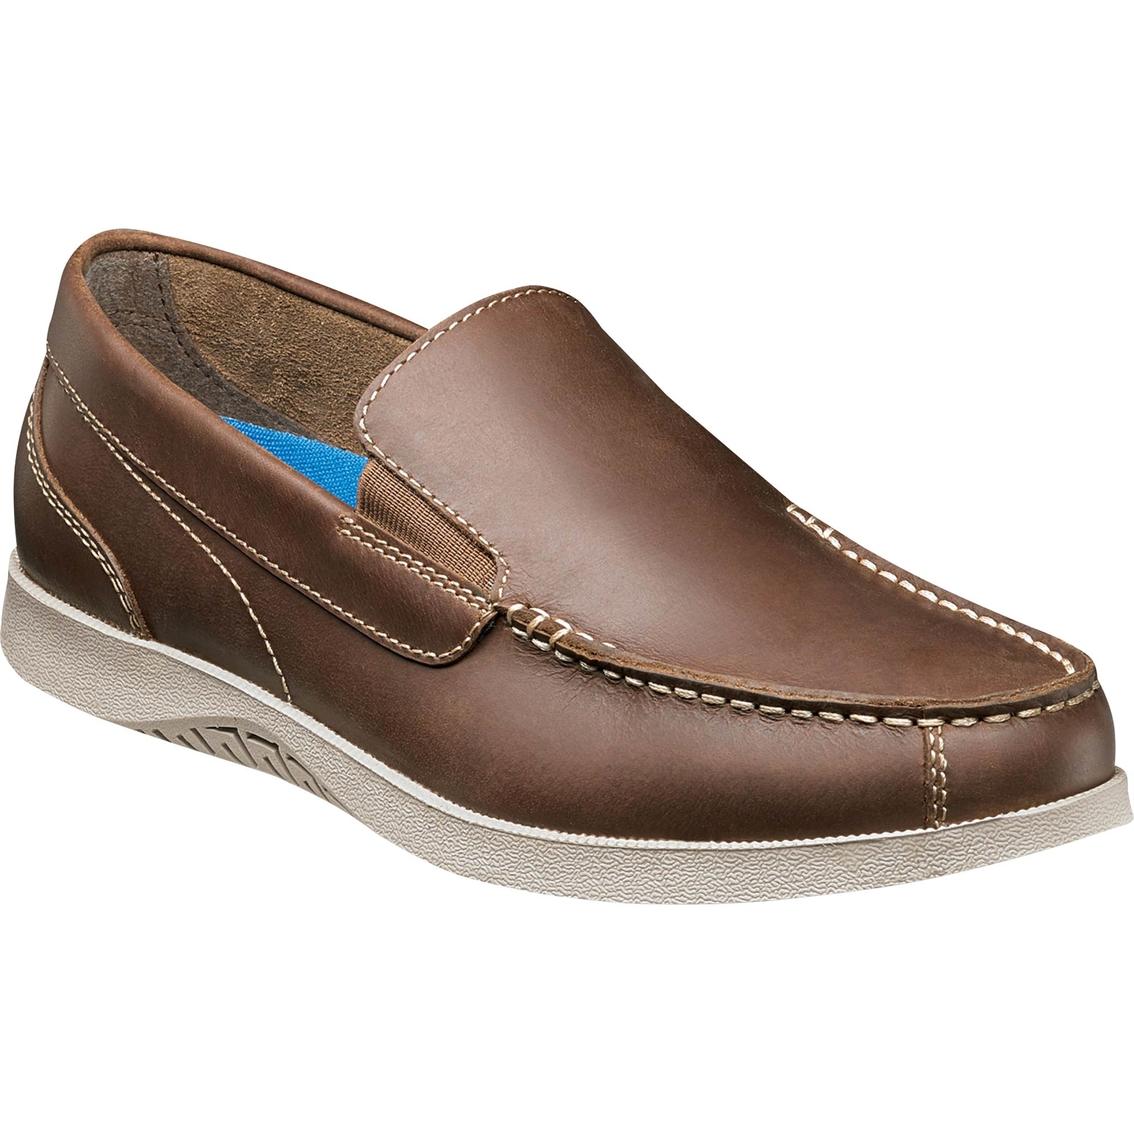 Nunn Bush Bayside Lites Moc Toe Venetian Casual Slip On Shoes sXw6dTl